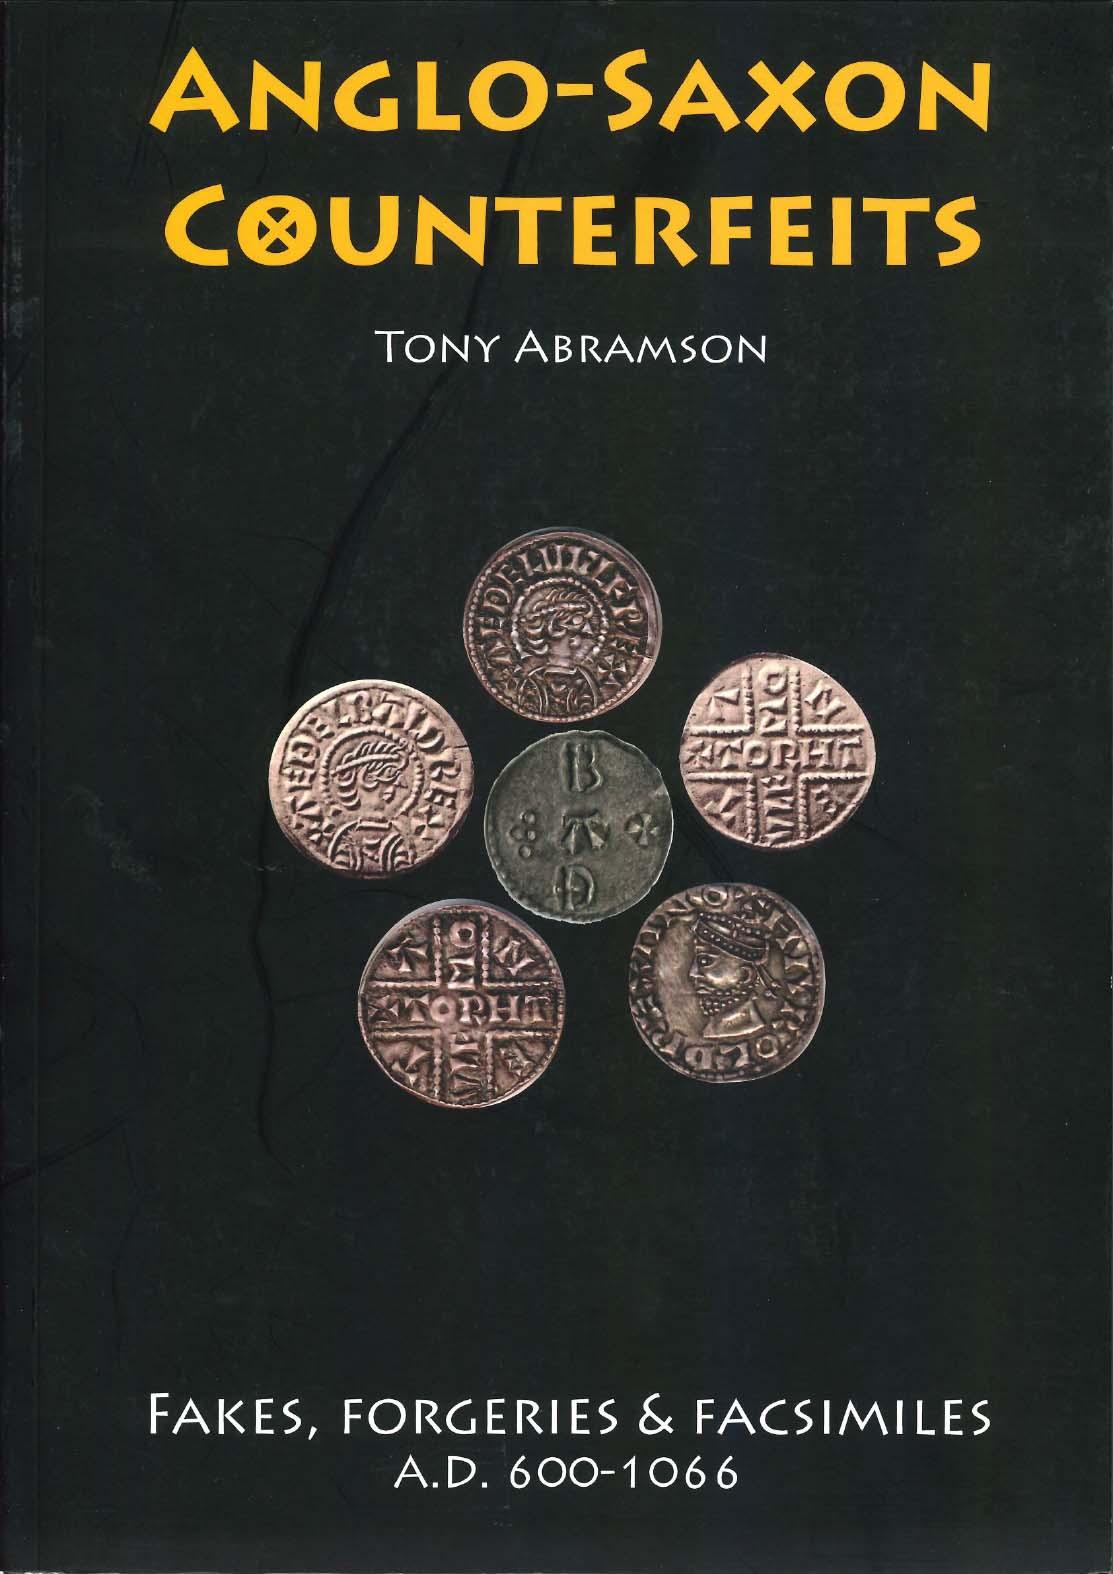 Anglo-Saxon Counterfeits. Fakes, Forgeries and Facsimiles.